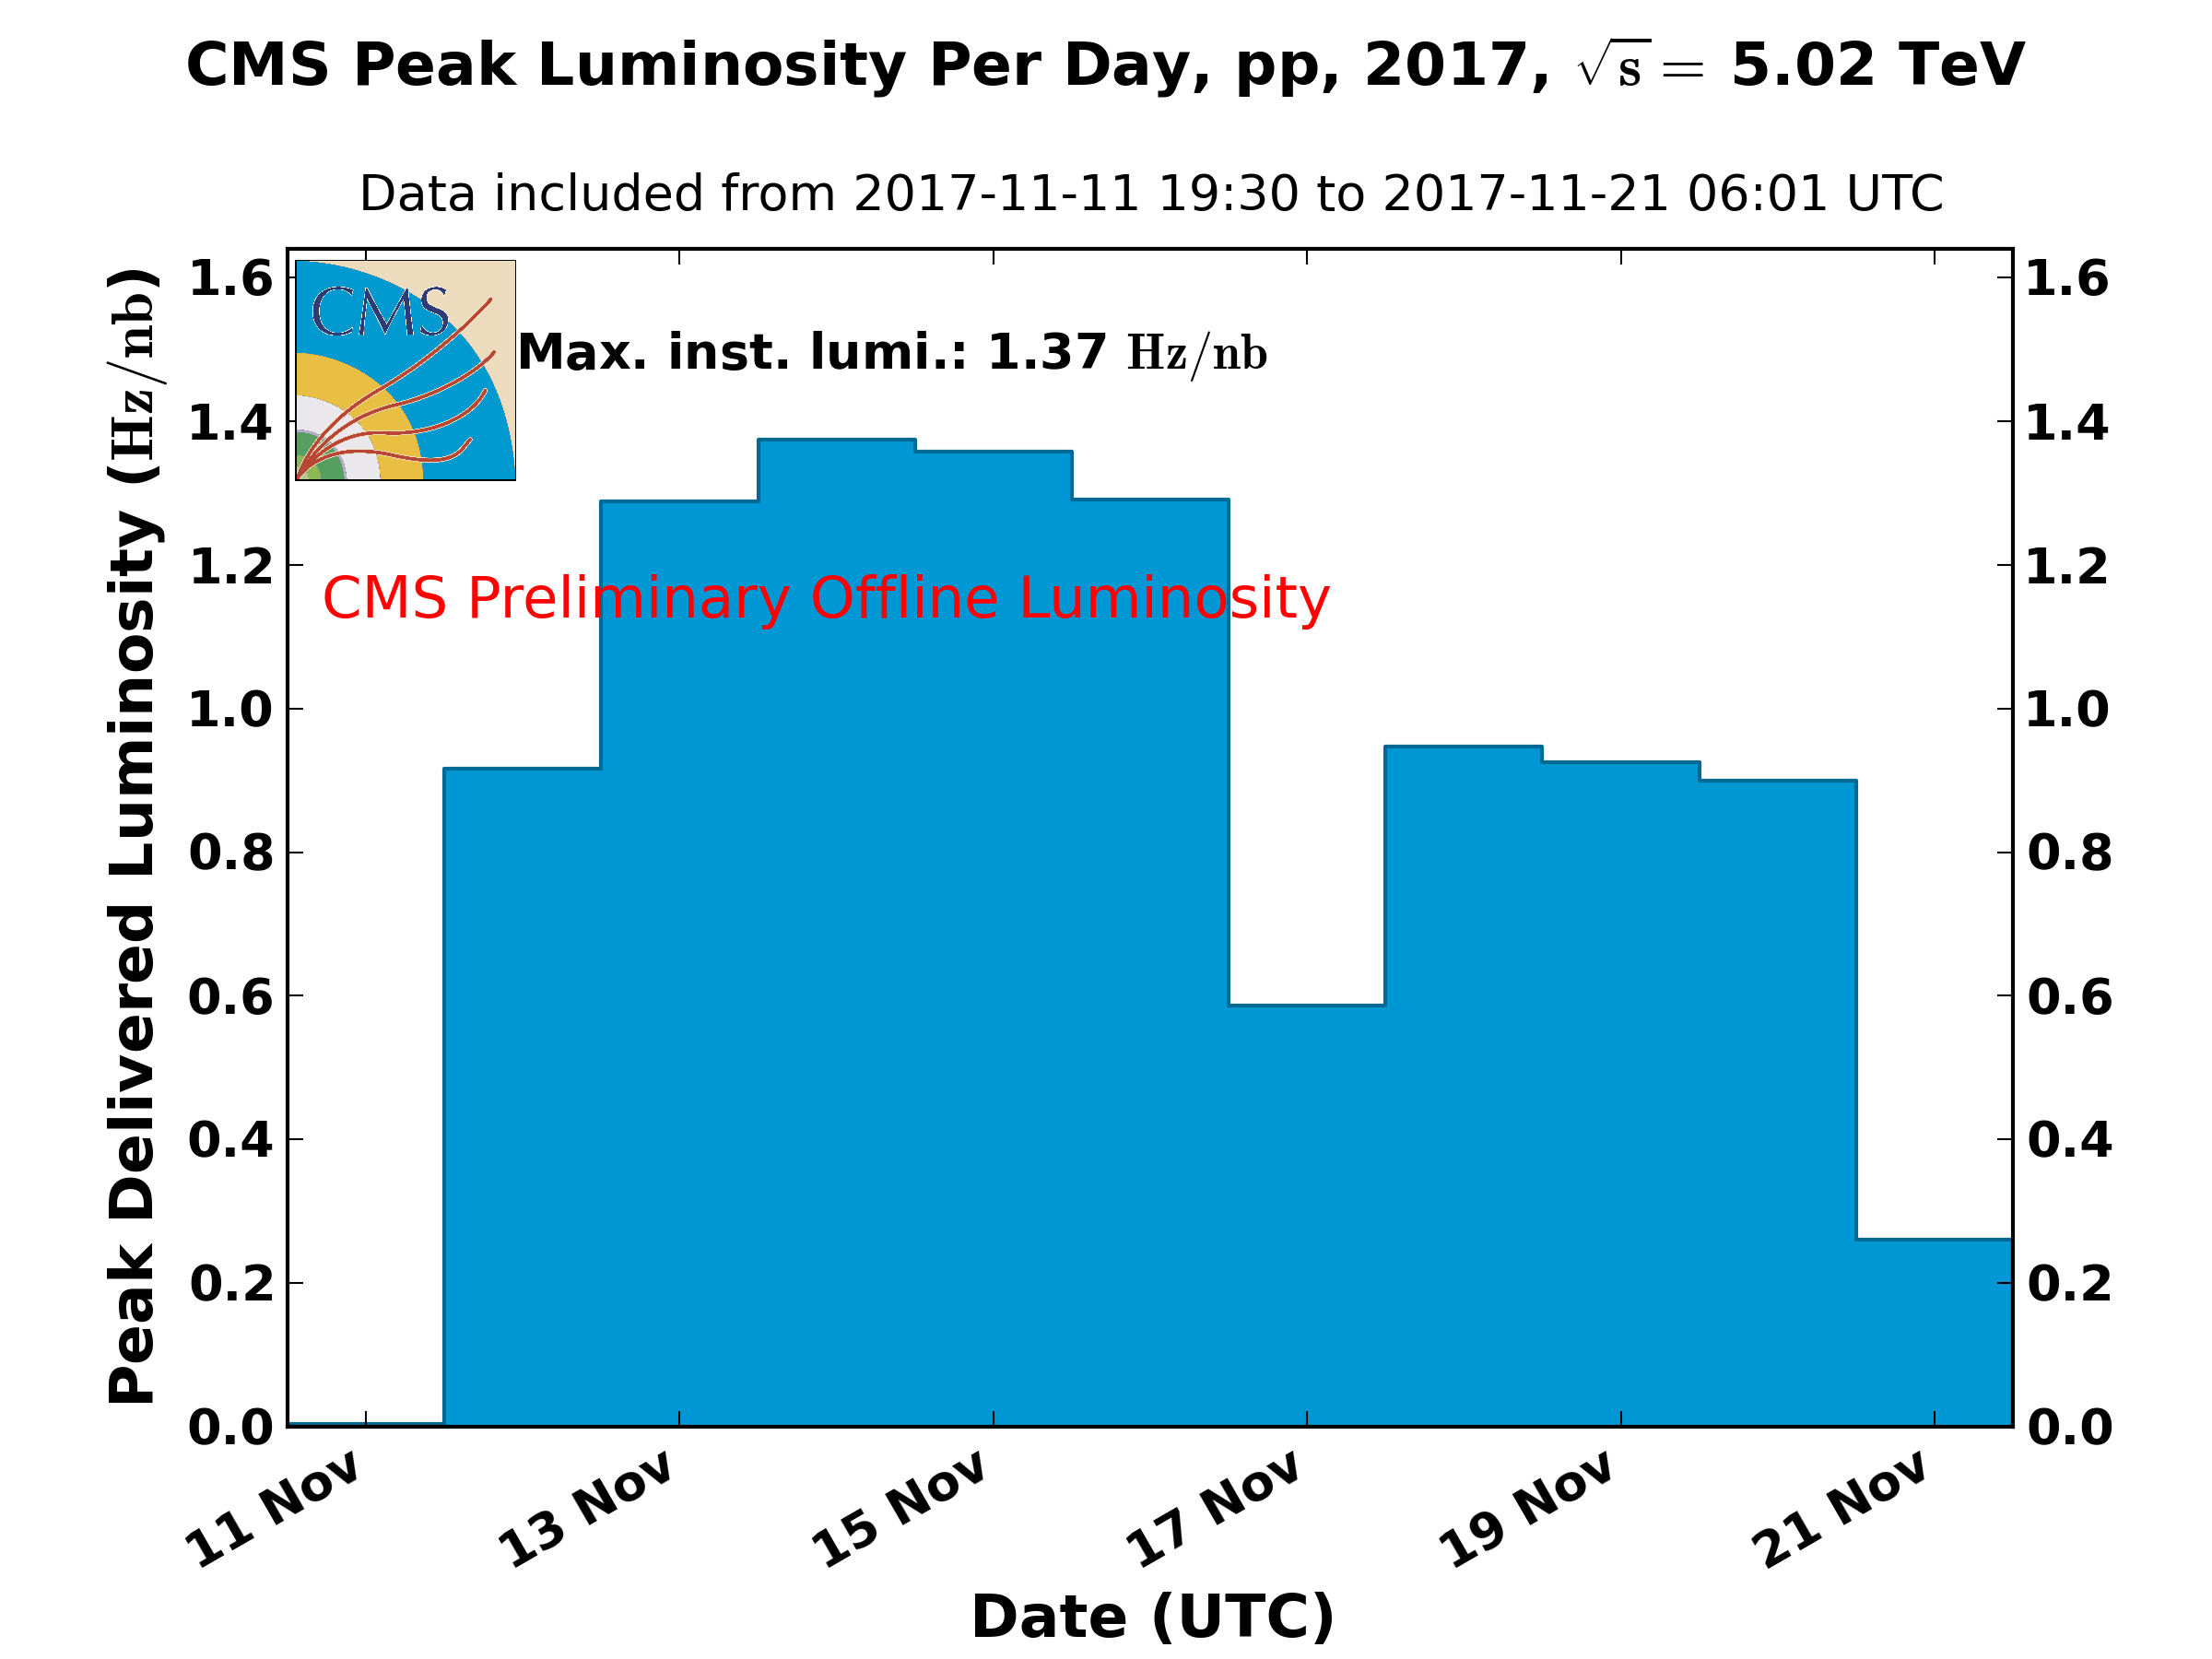 https://cern.ch/cmslumi/publicplots/peak_lumi_per_day_pp_2017_5TeV_NormtagLumi.png